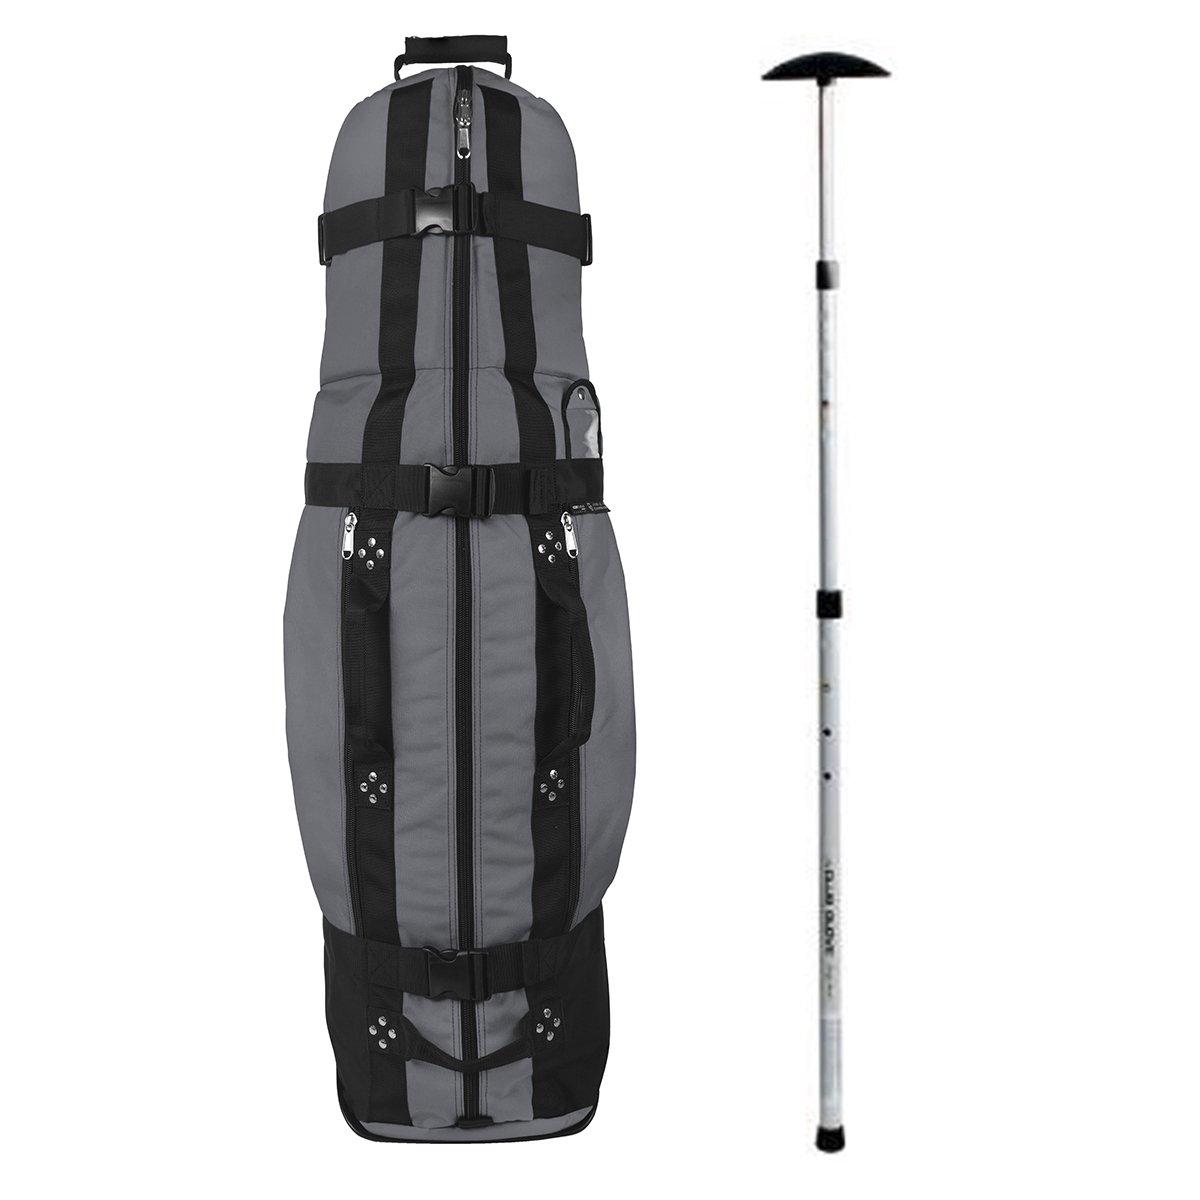 Club Glove Last Bag Collegiate Golf Travel Cover w/ Free Stiff Arm (Charcoal)